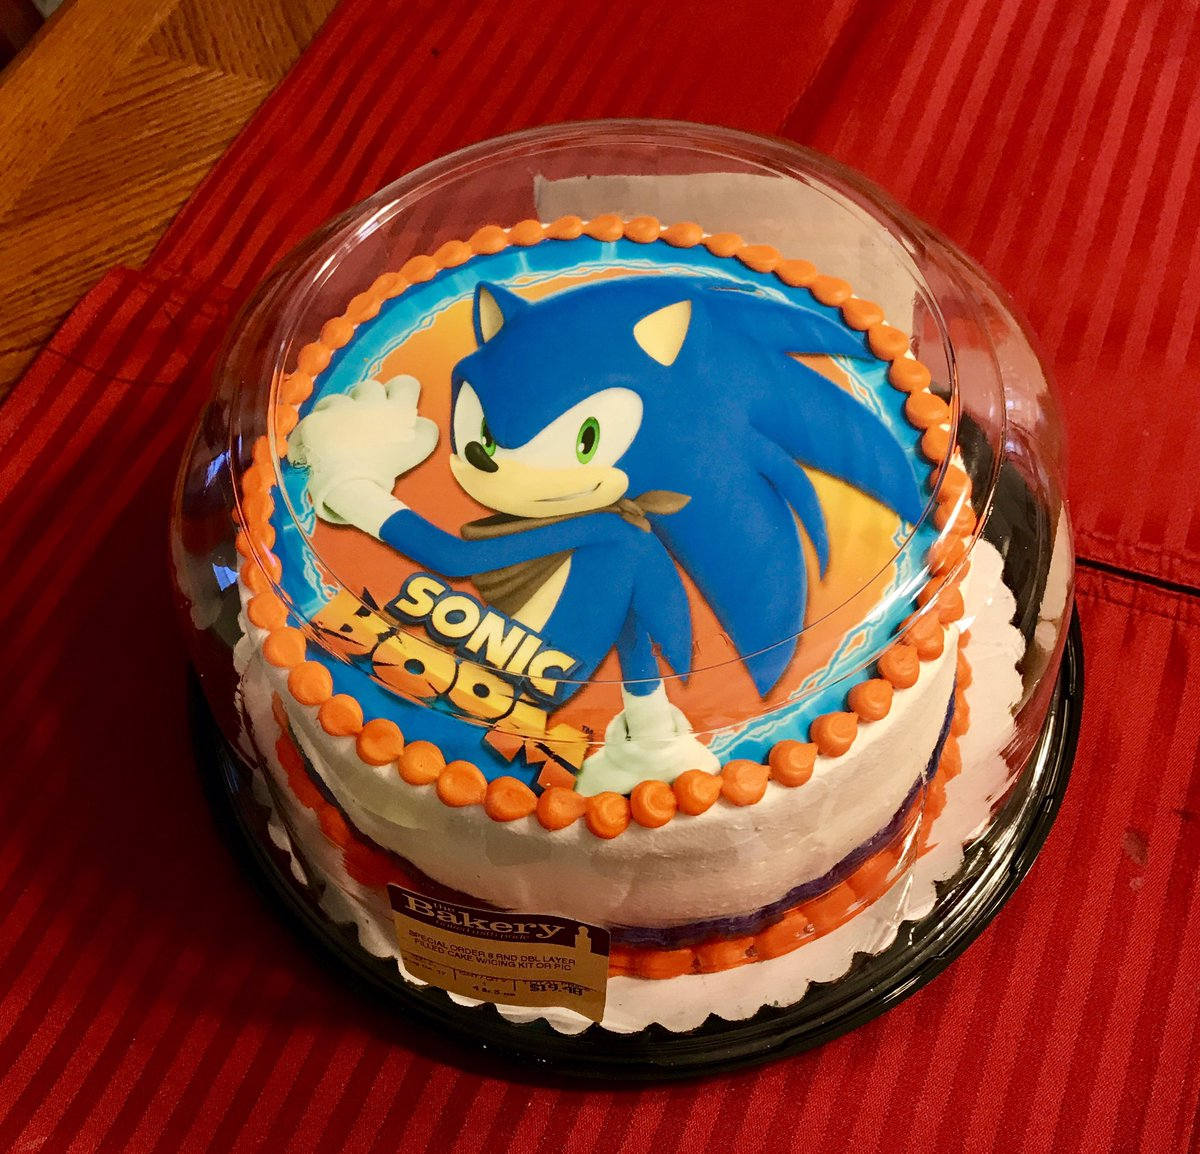 Sonic Birthday Cake Walmart | thepiercingstudio